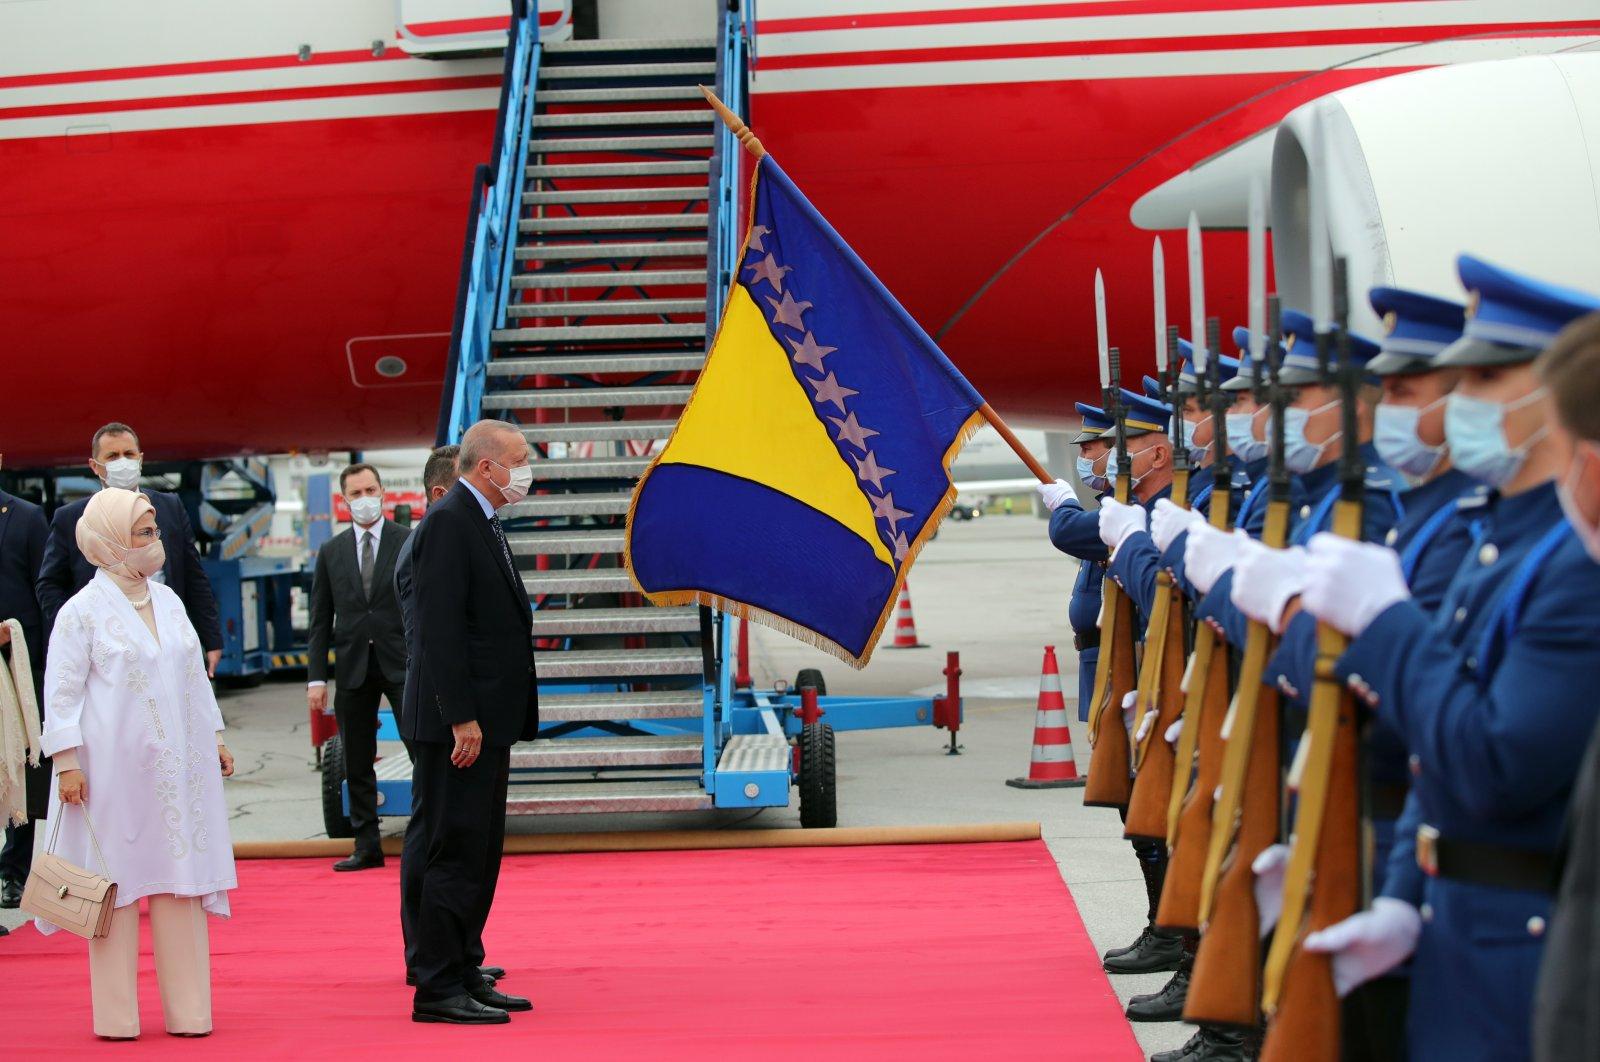 President Recep Tayyip Erdoğan greets soldiers at the airport in Sarajevo, Bosnia-Herzegovina, Aug. 27, 2021. (DHA Photo)